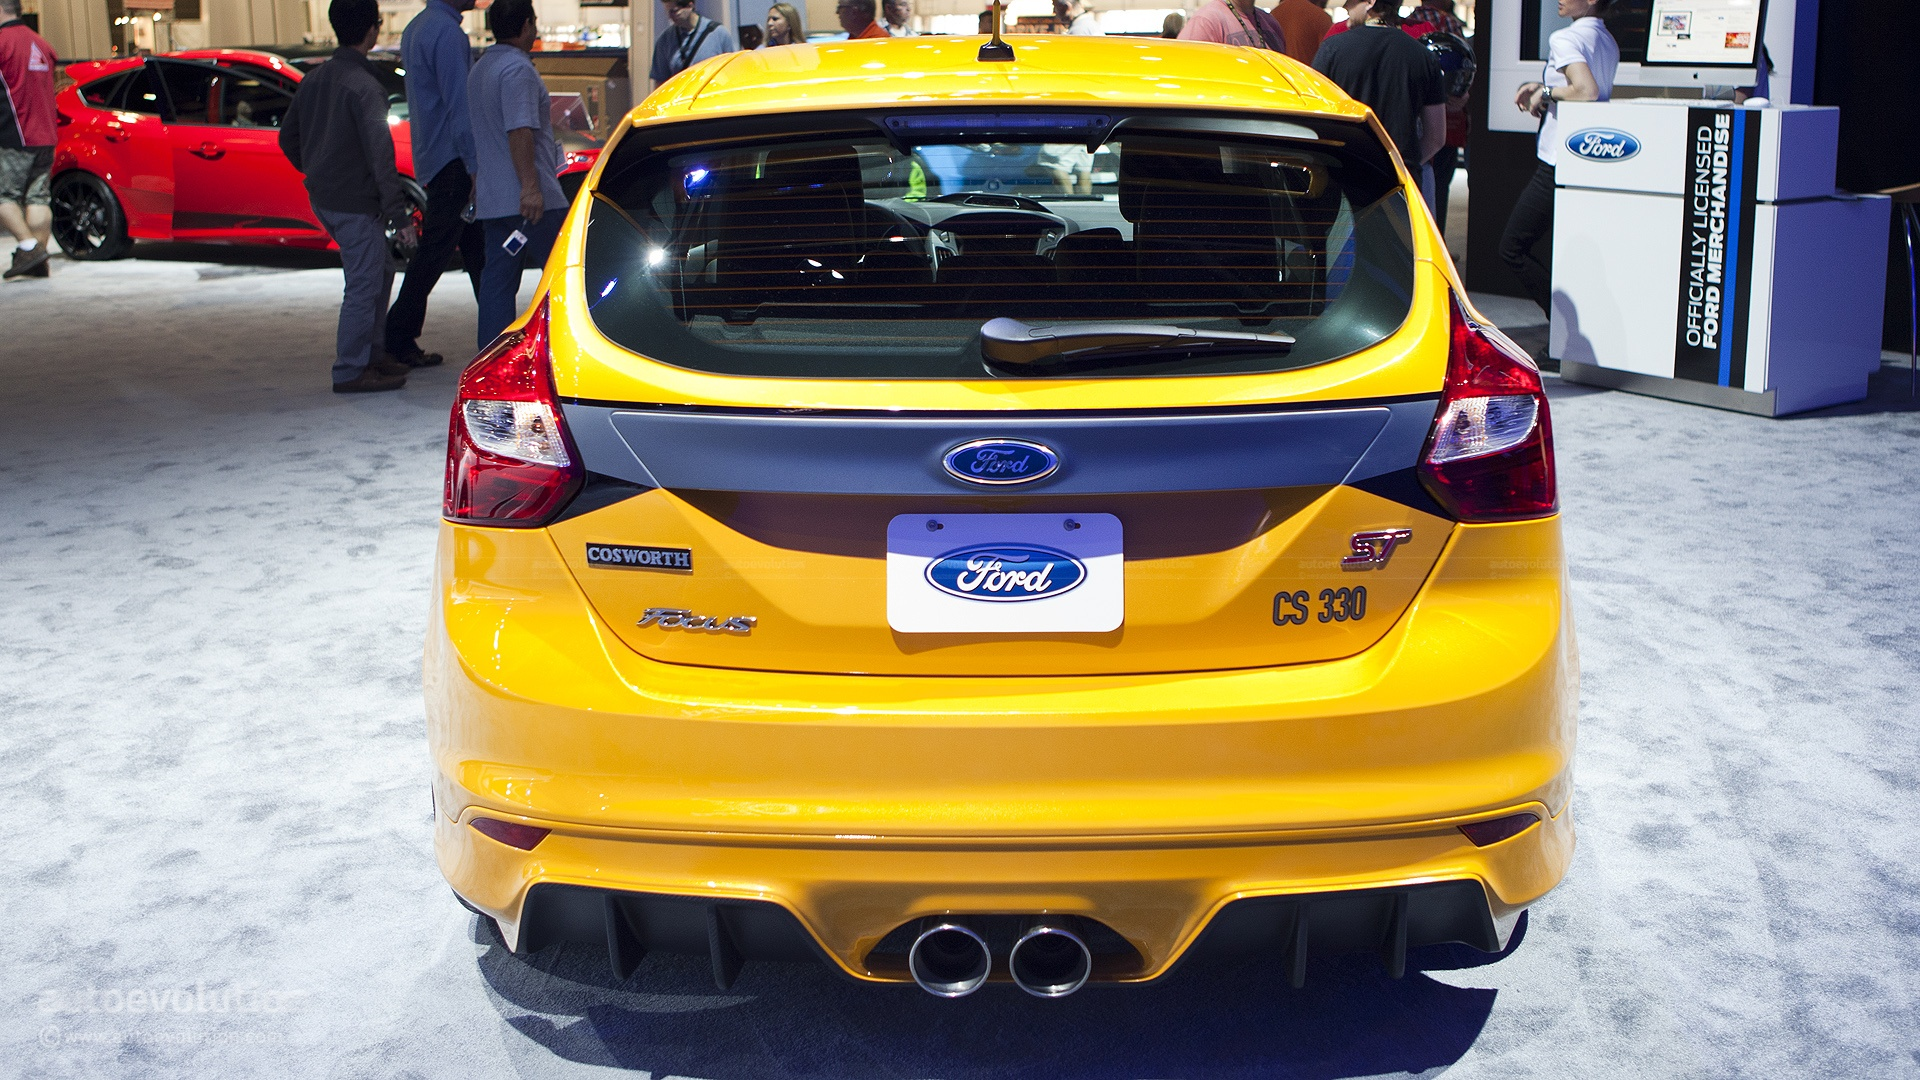 Ford Focus Cosworth Development Car